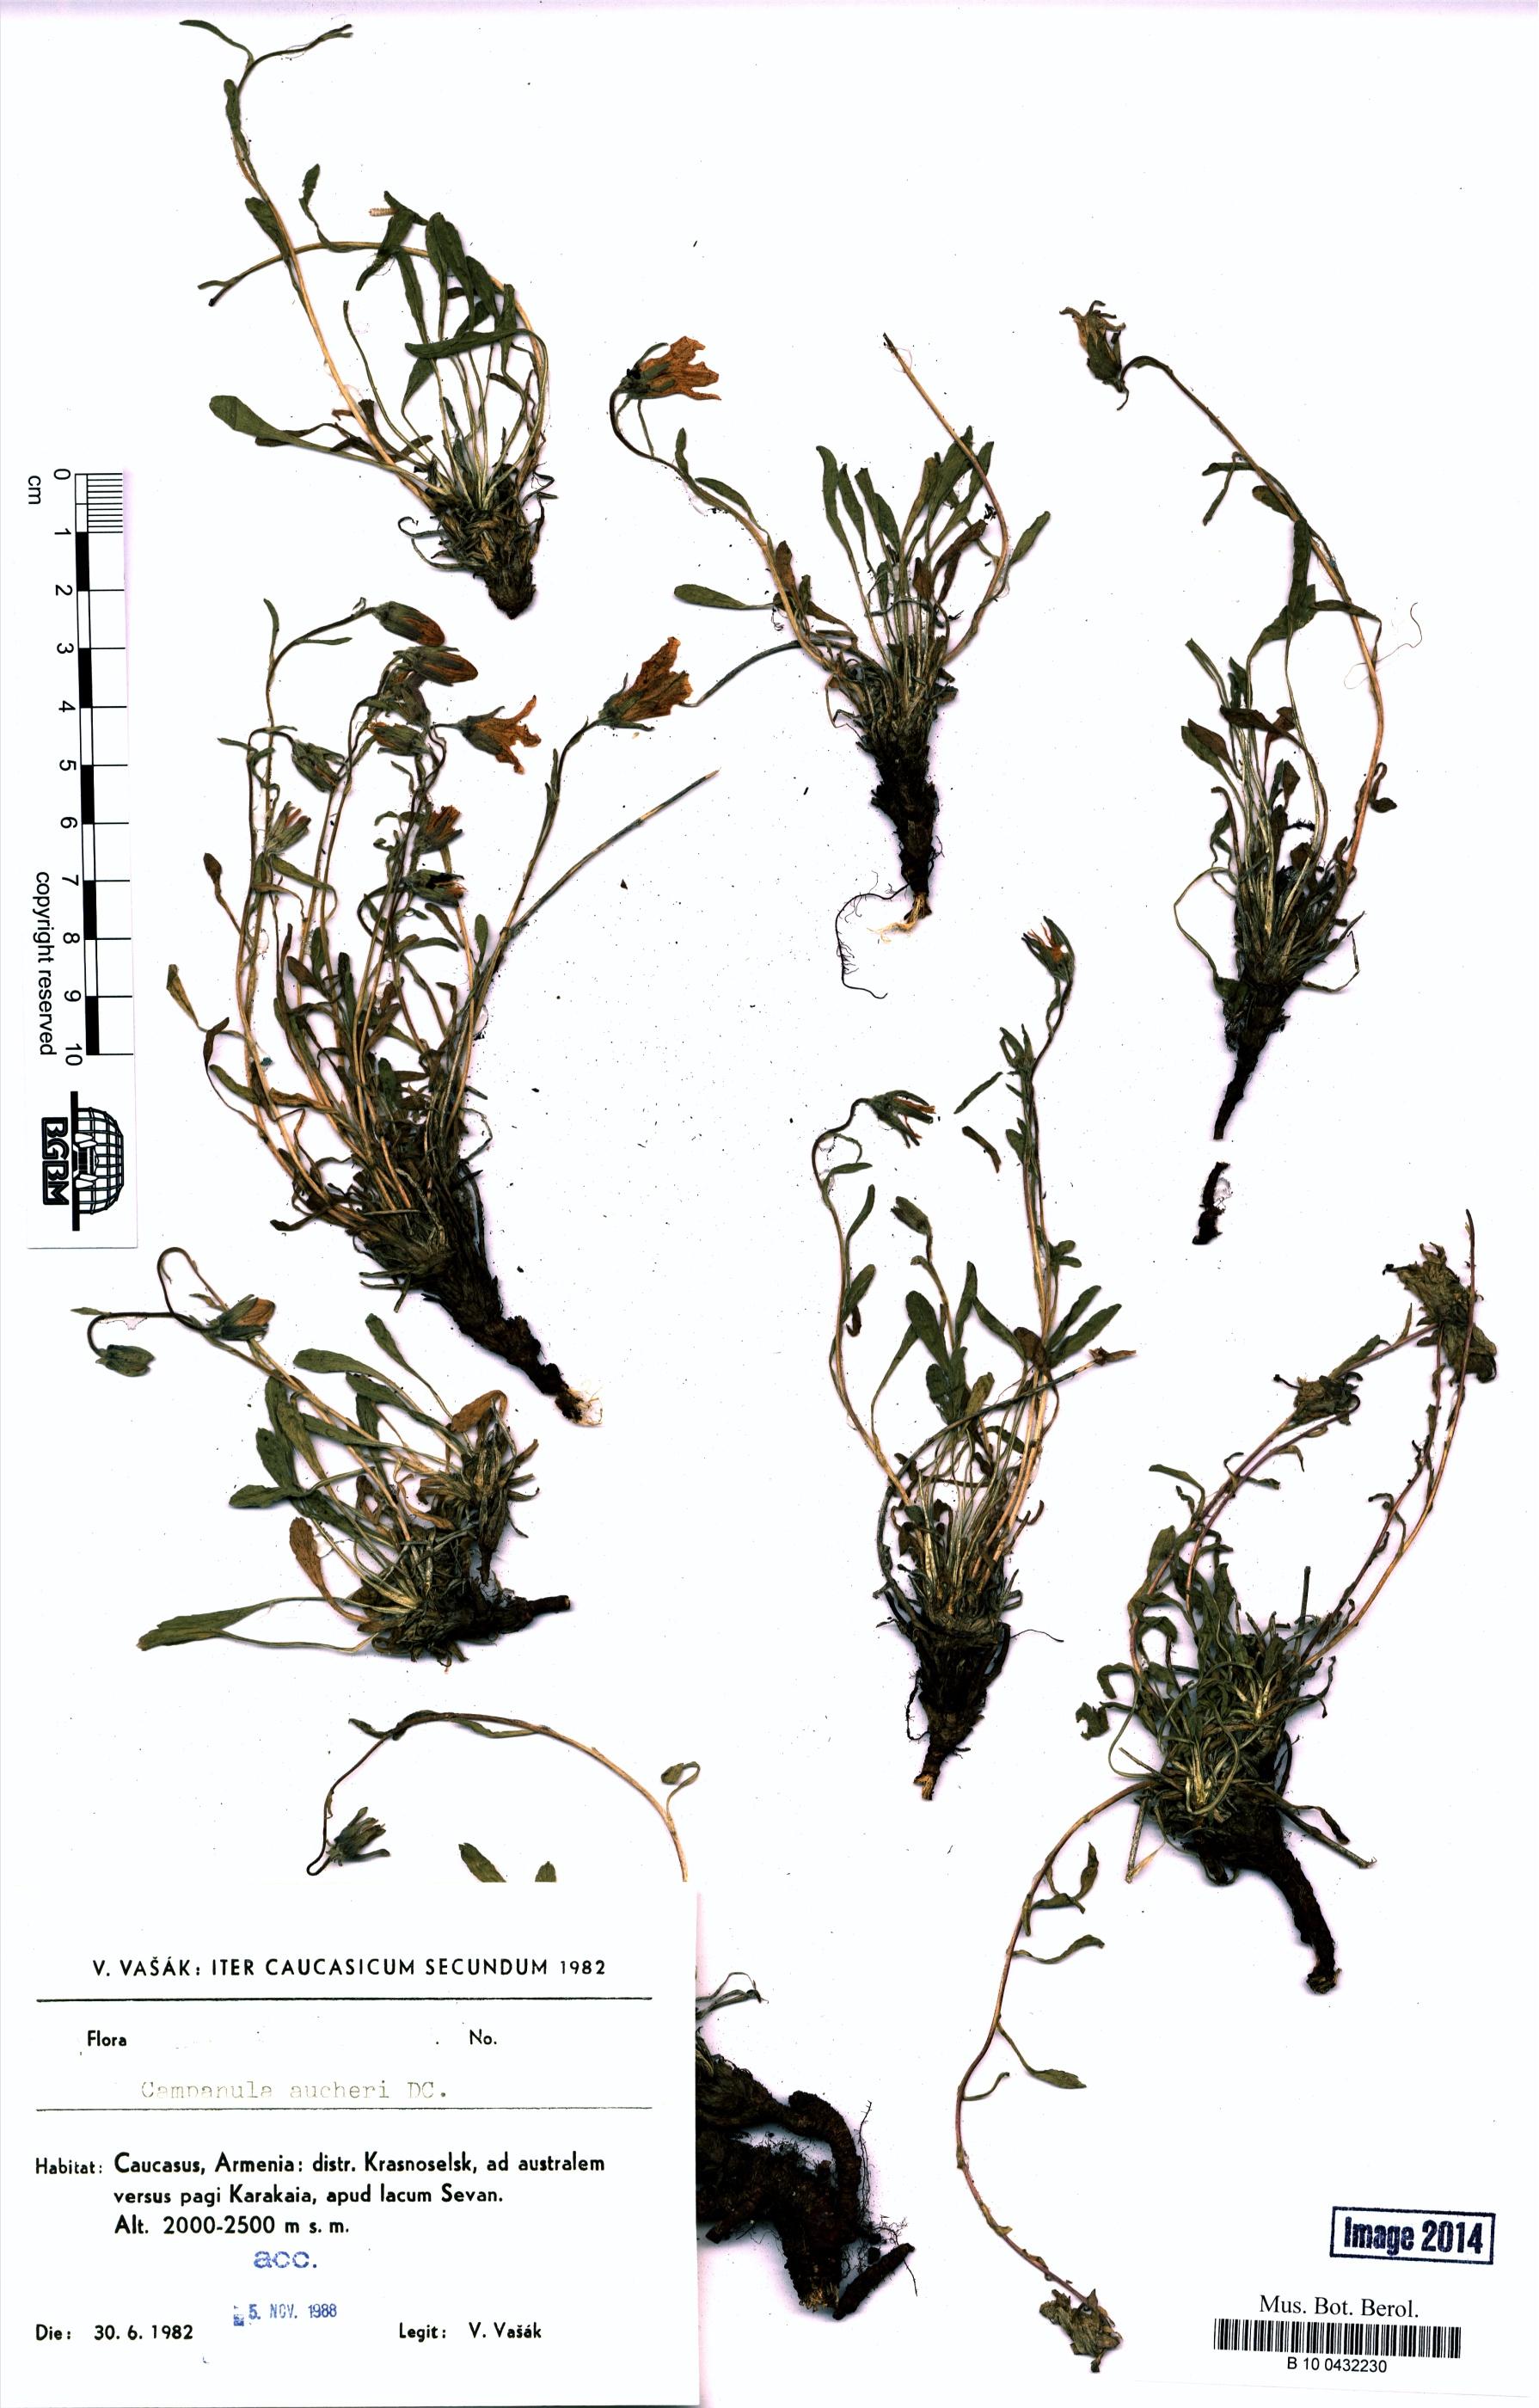 http://ww2.bgbm.org/herbarium/images/B/10/04/32/23/B_10_0432230.jpg